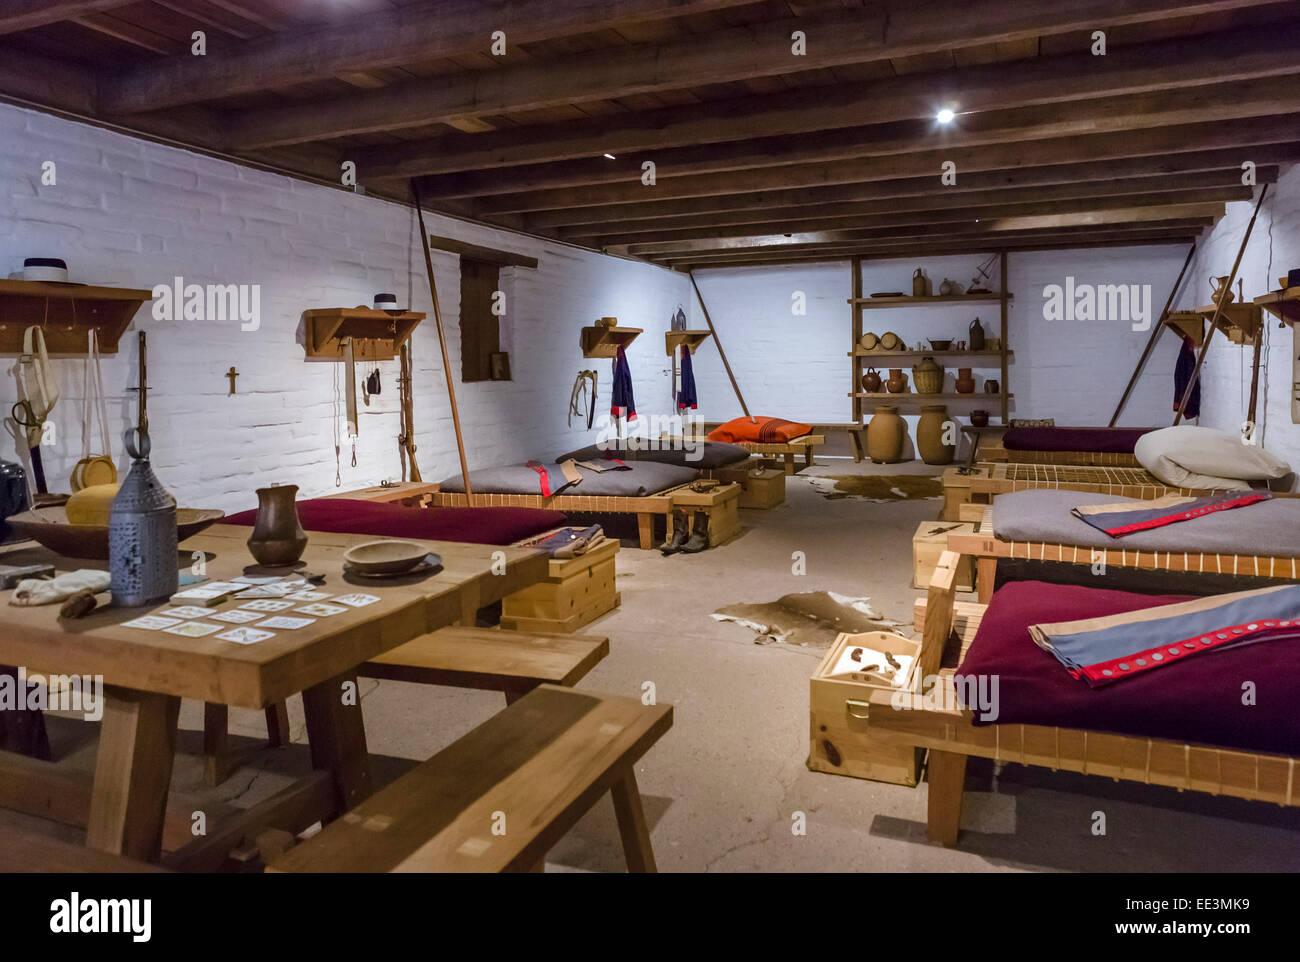 Interior of Sonoma Barracks, Sonoma State Historic Park, Sonoma, California, USA - Stock Image